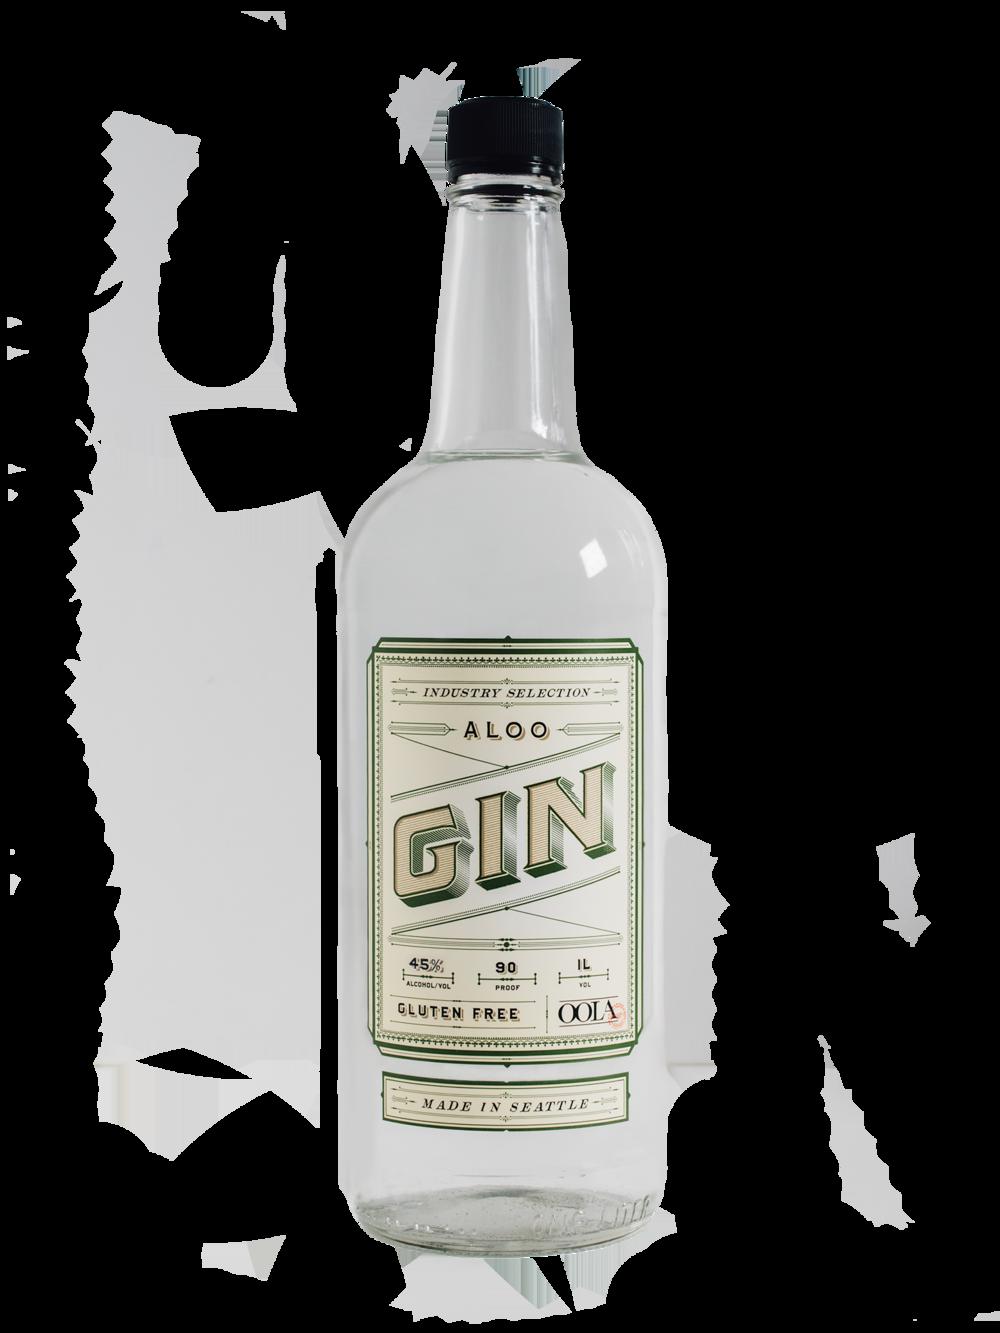 aloo_gin_bottle_shot_2018.png